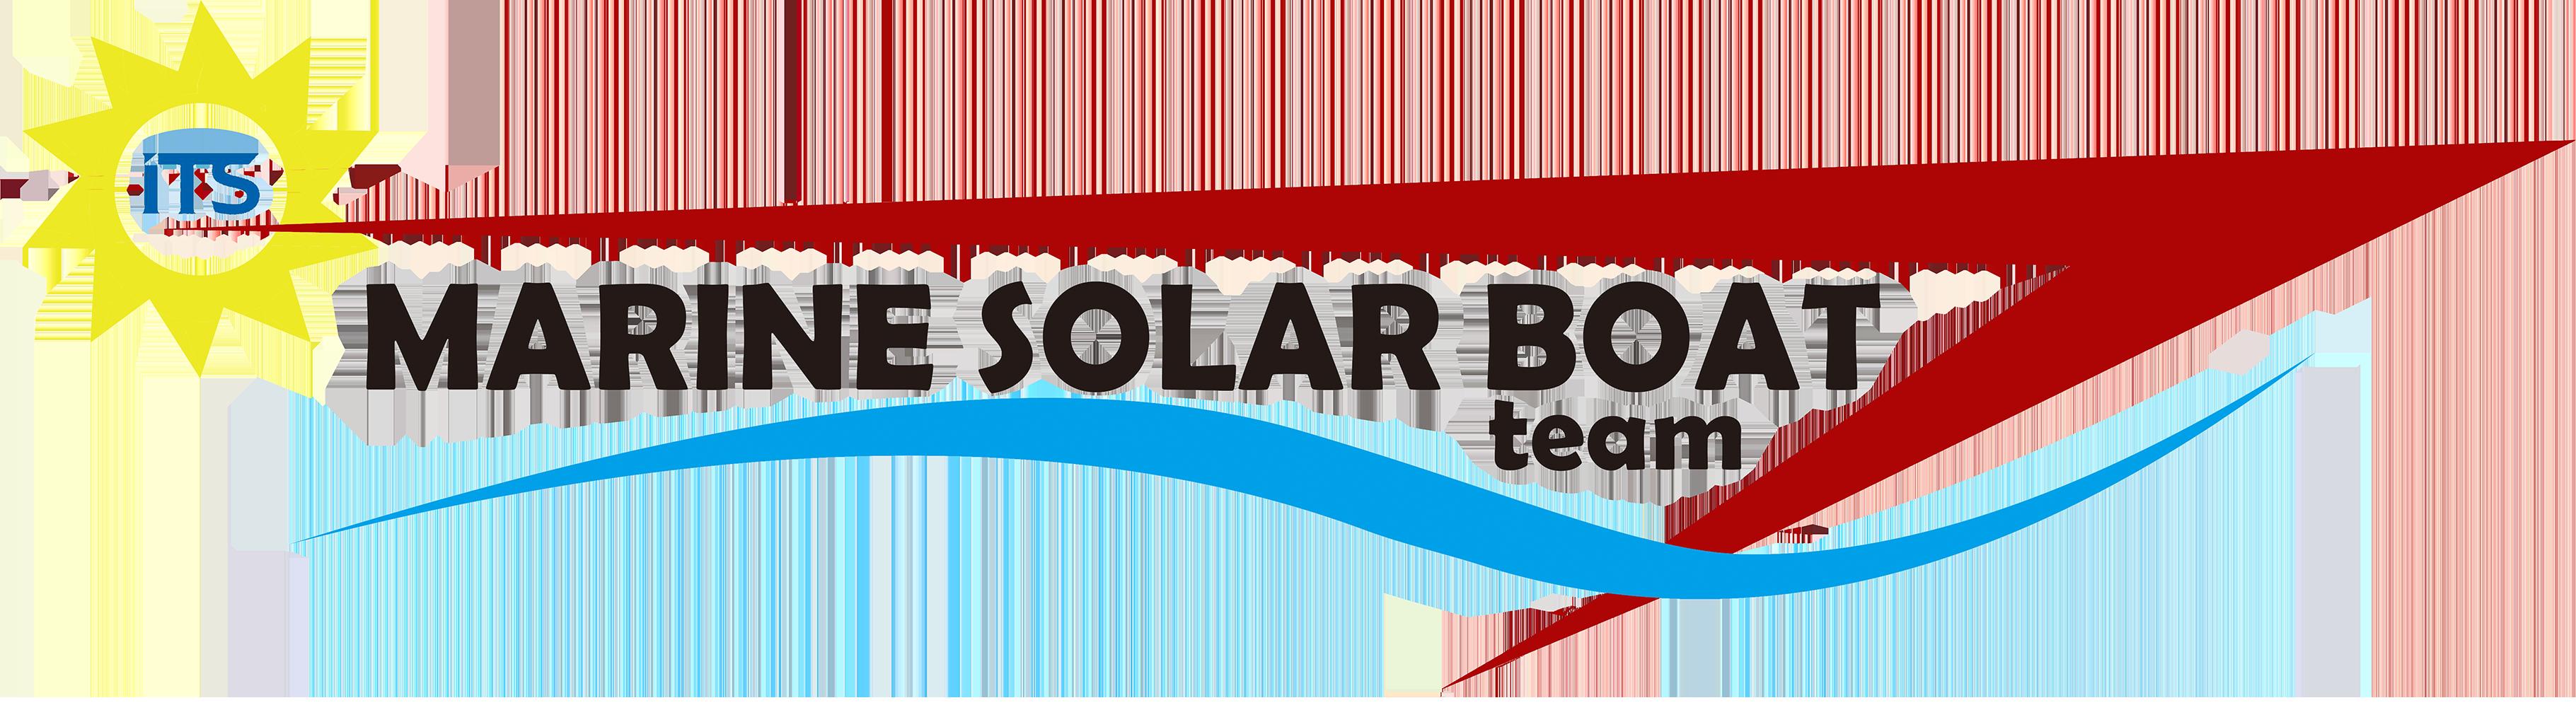 ITS Marine Solar Boat Team